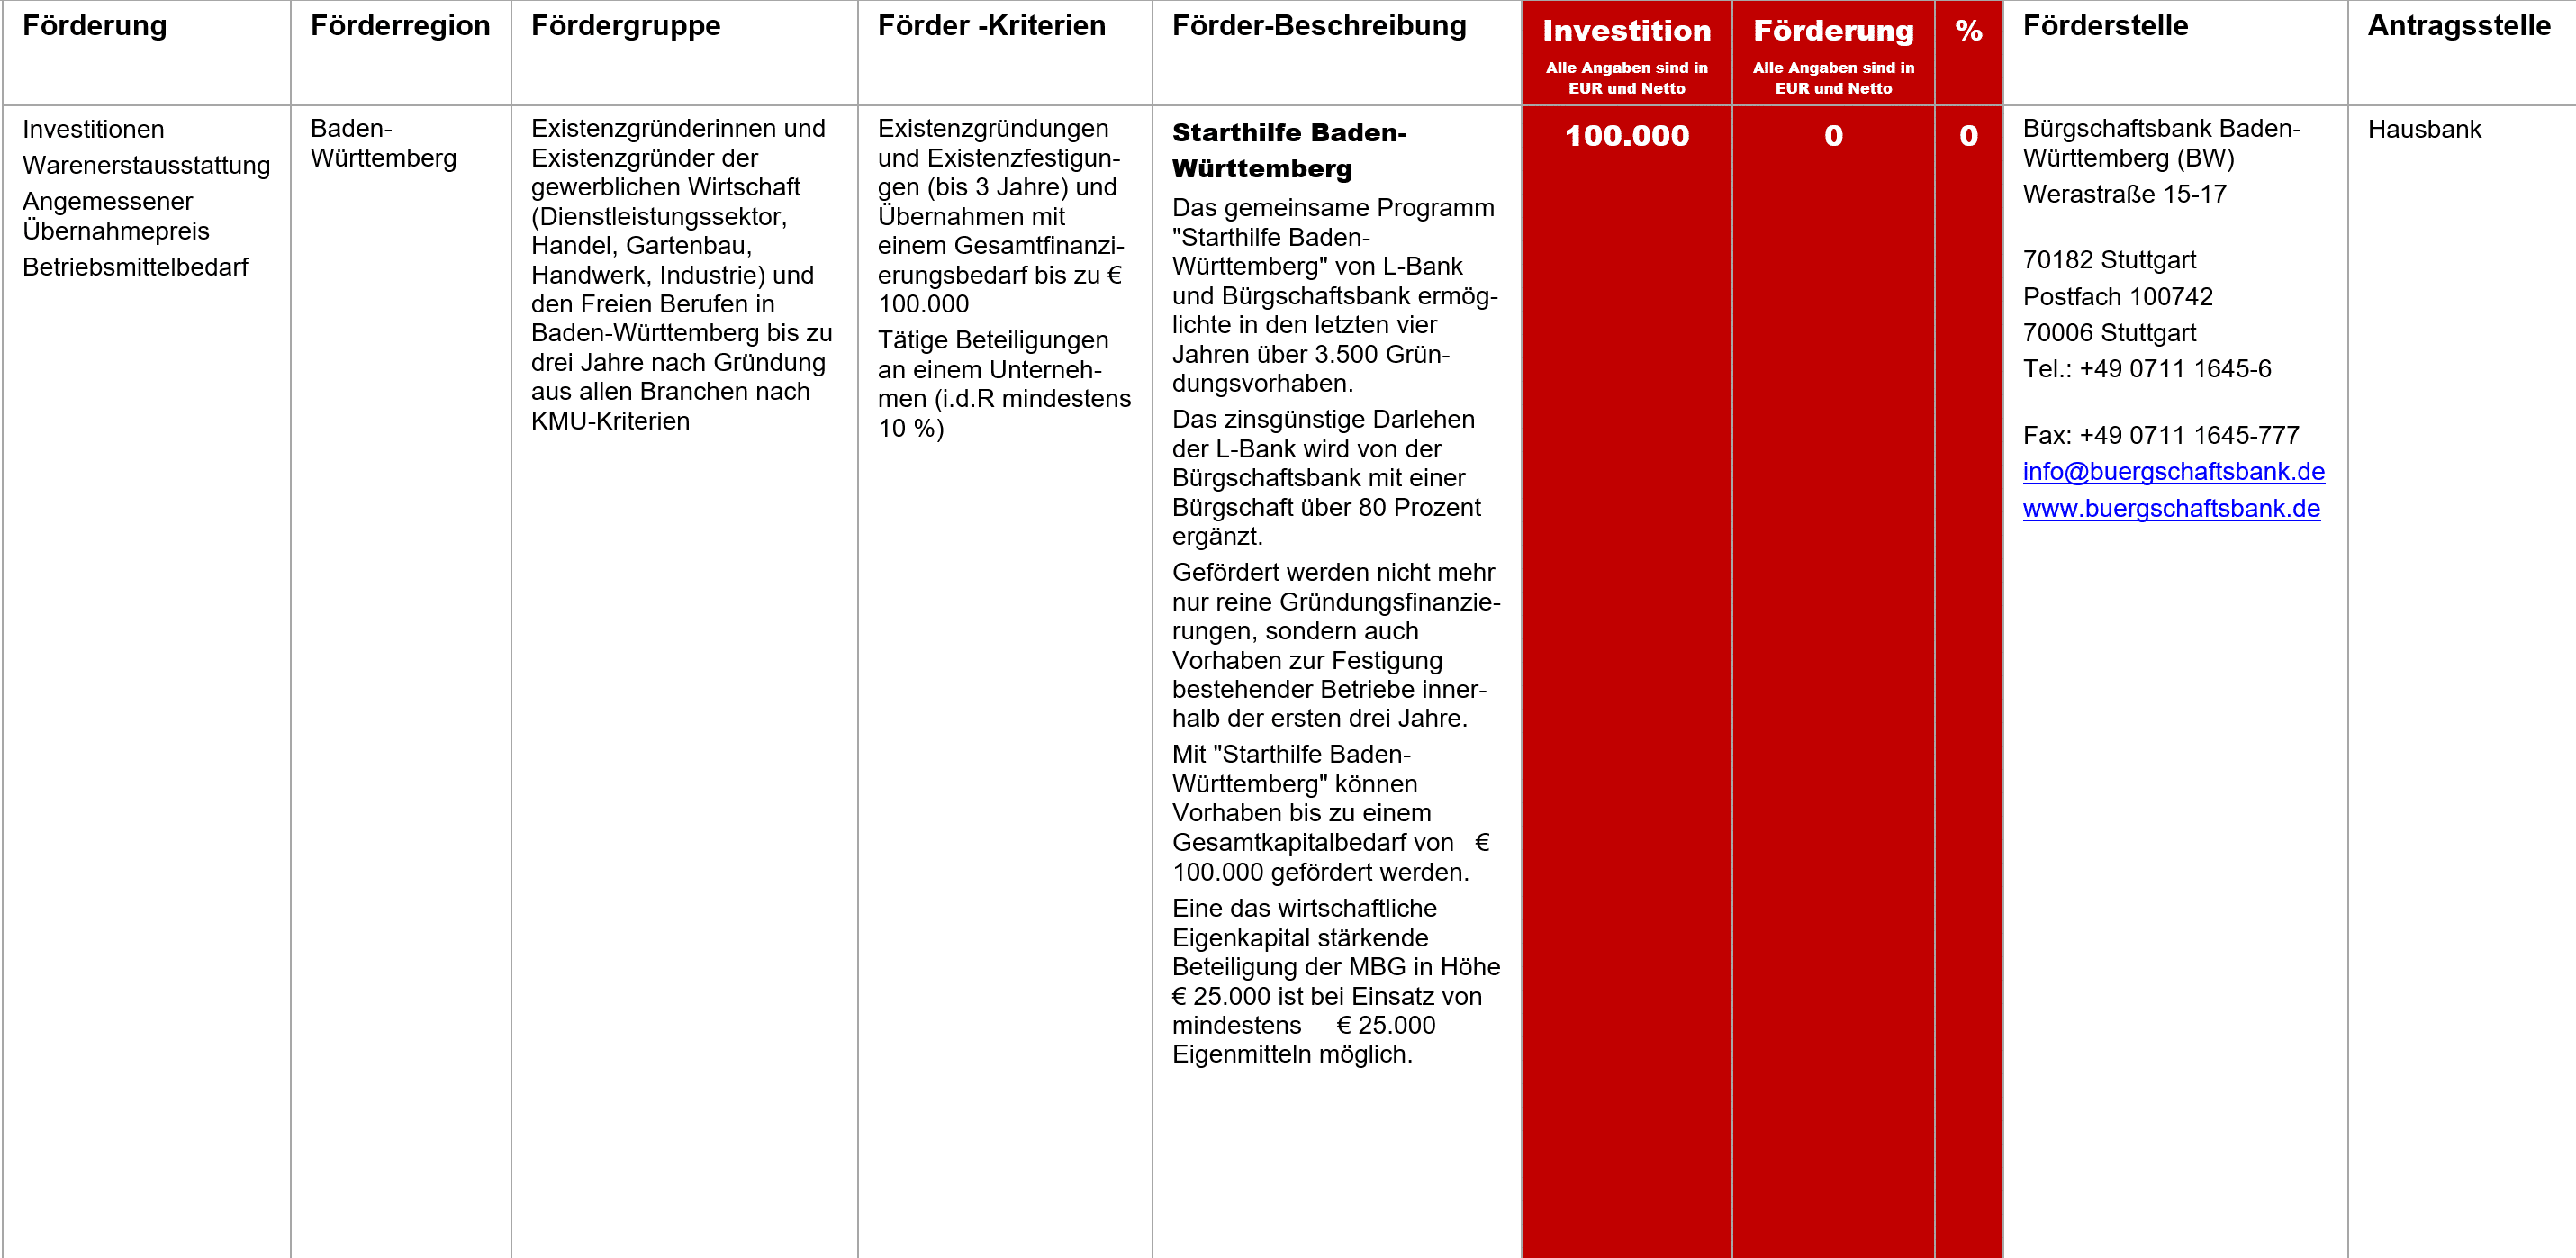 Starthilfe Baden-Württemberg, Fördermittel – Starthilfe Baden-Württemberg